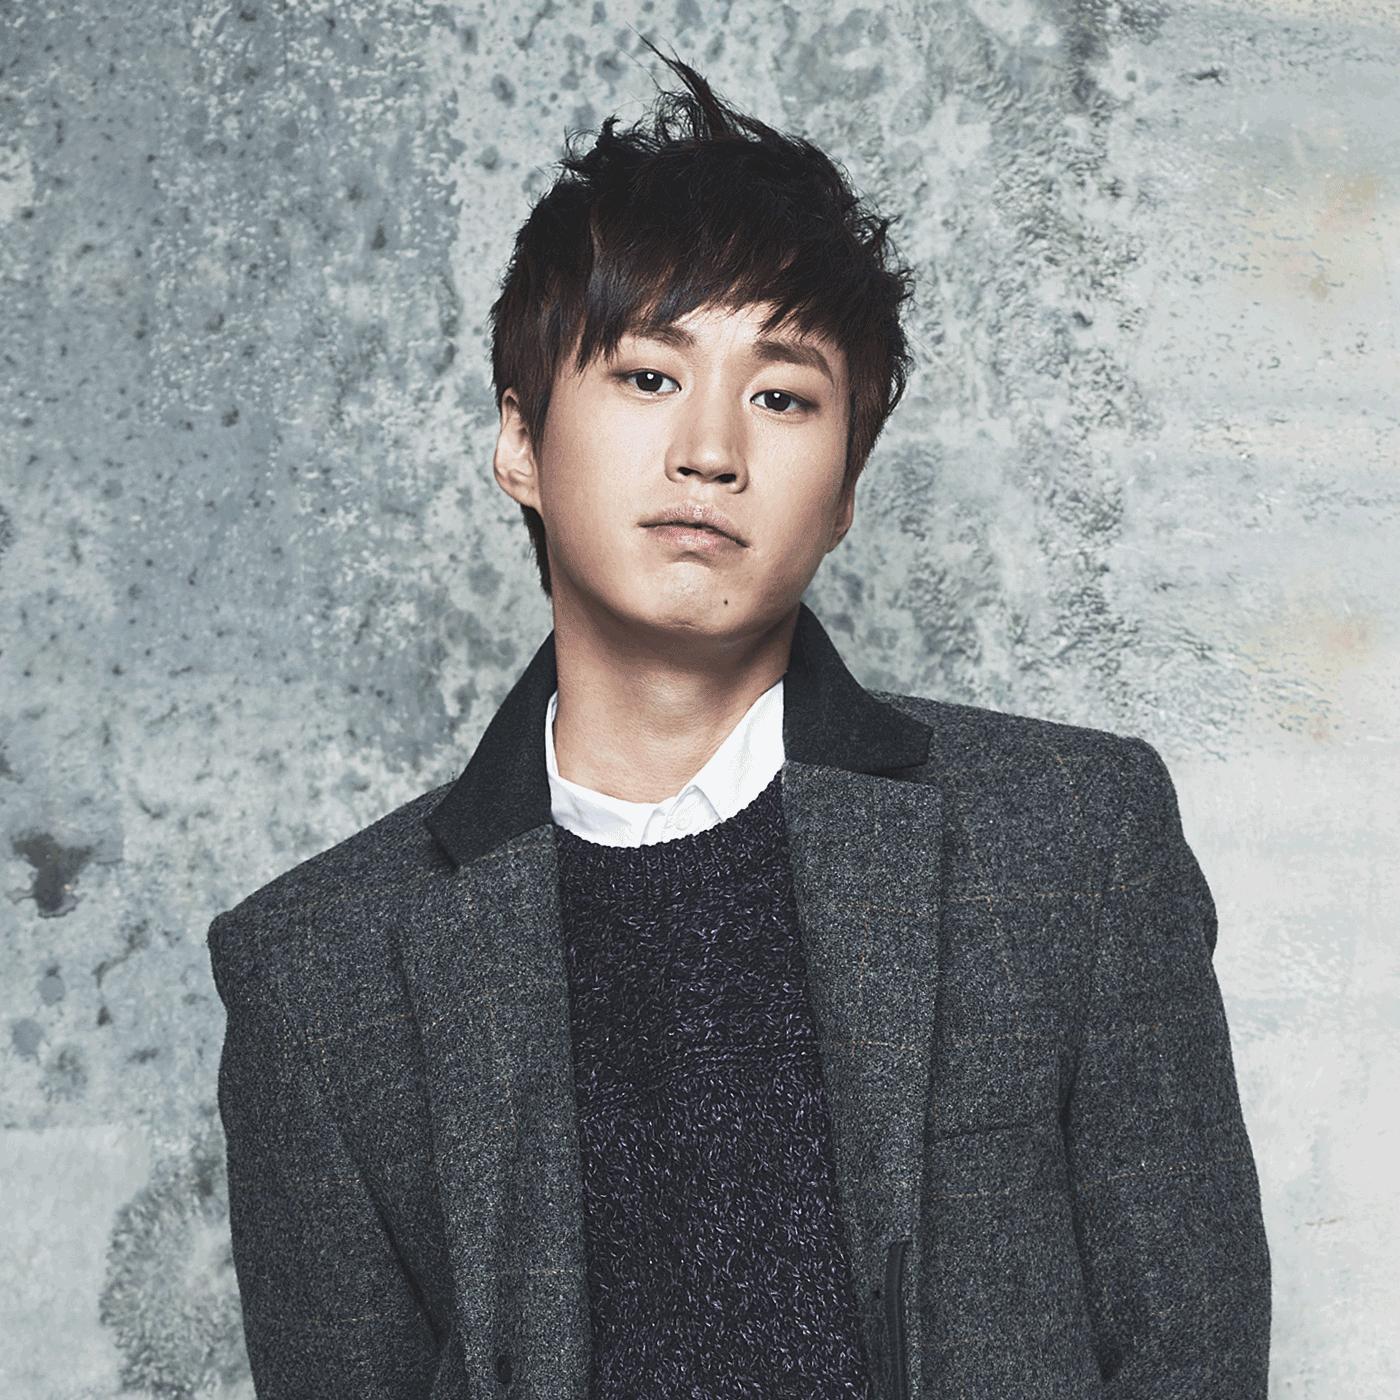 Tablo Gets Harassed By Tajinyo Once Again Kpopmusic Com Korean Celebrities Alternative Hip Hop Kang Hye Jung